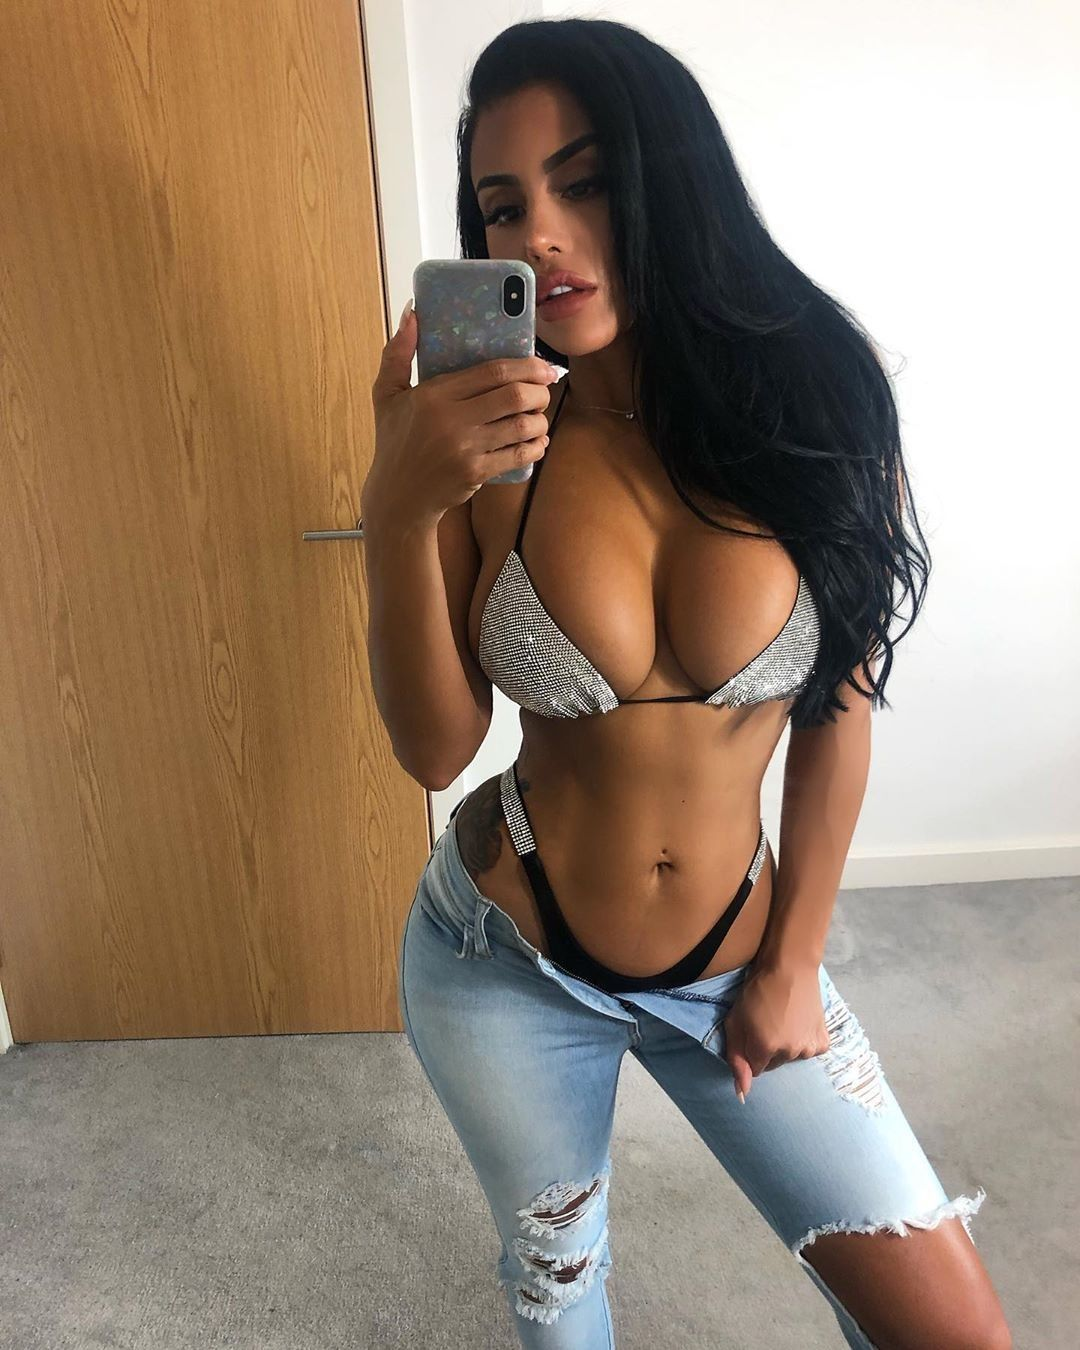 Chloe Saxon Nude & Sexy 0114